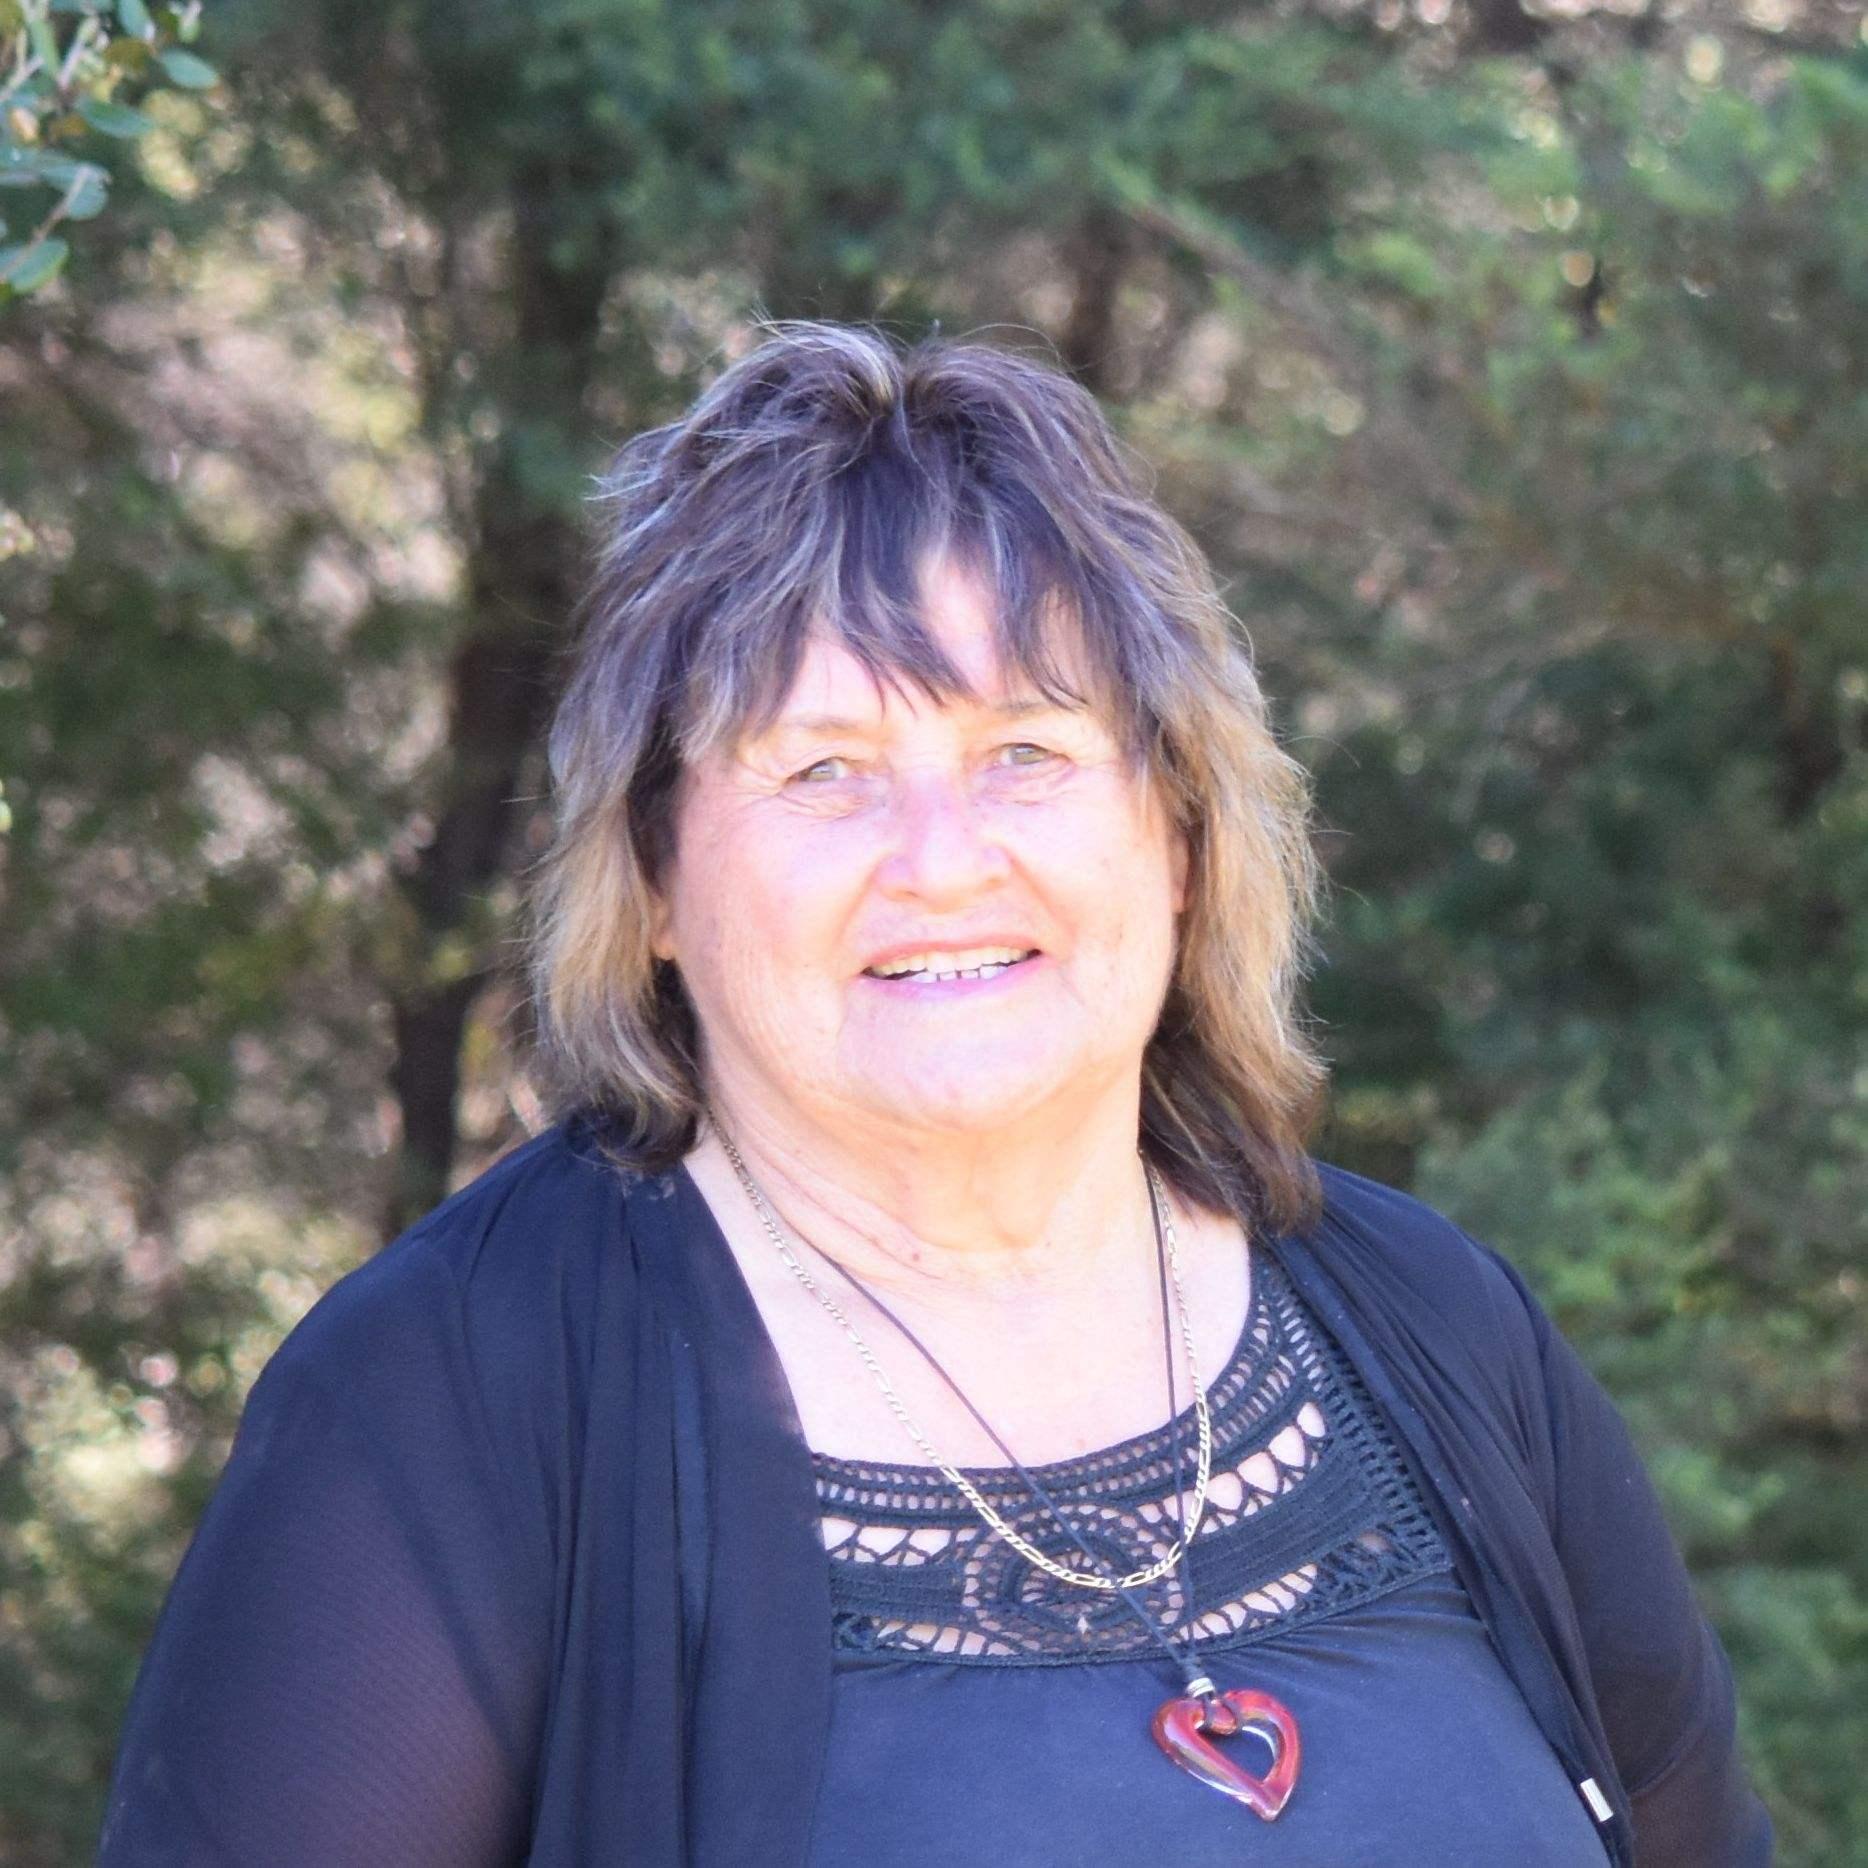 Cynthia Hedger